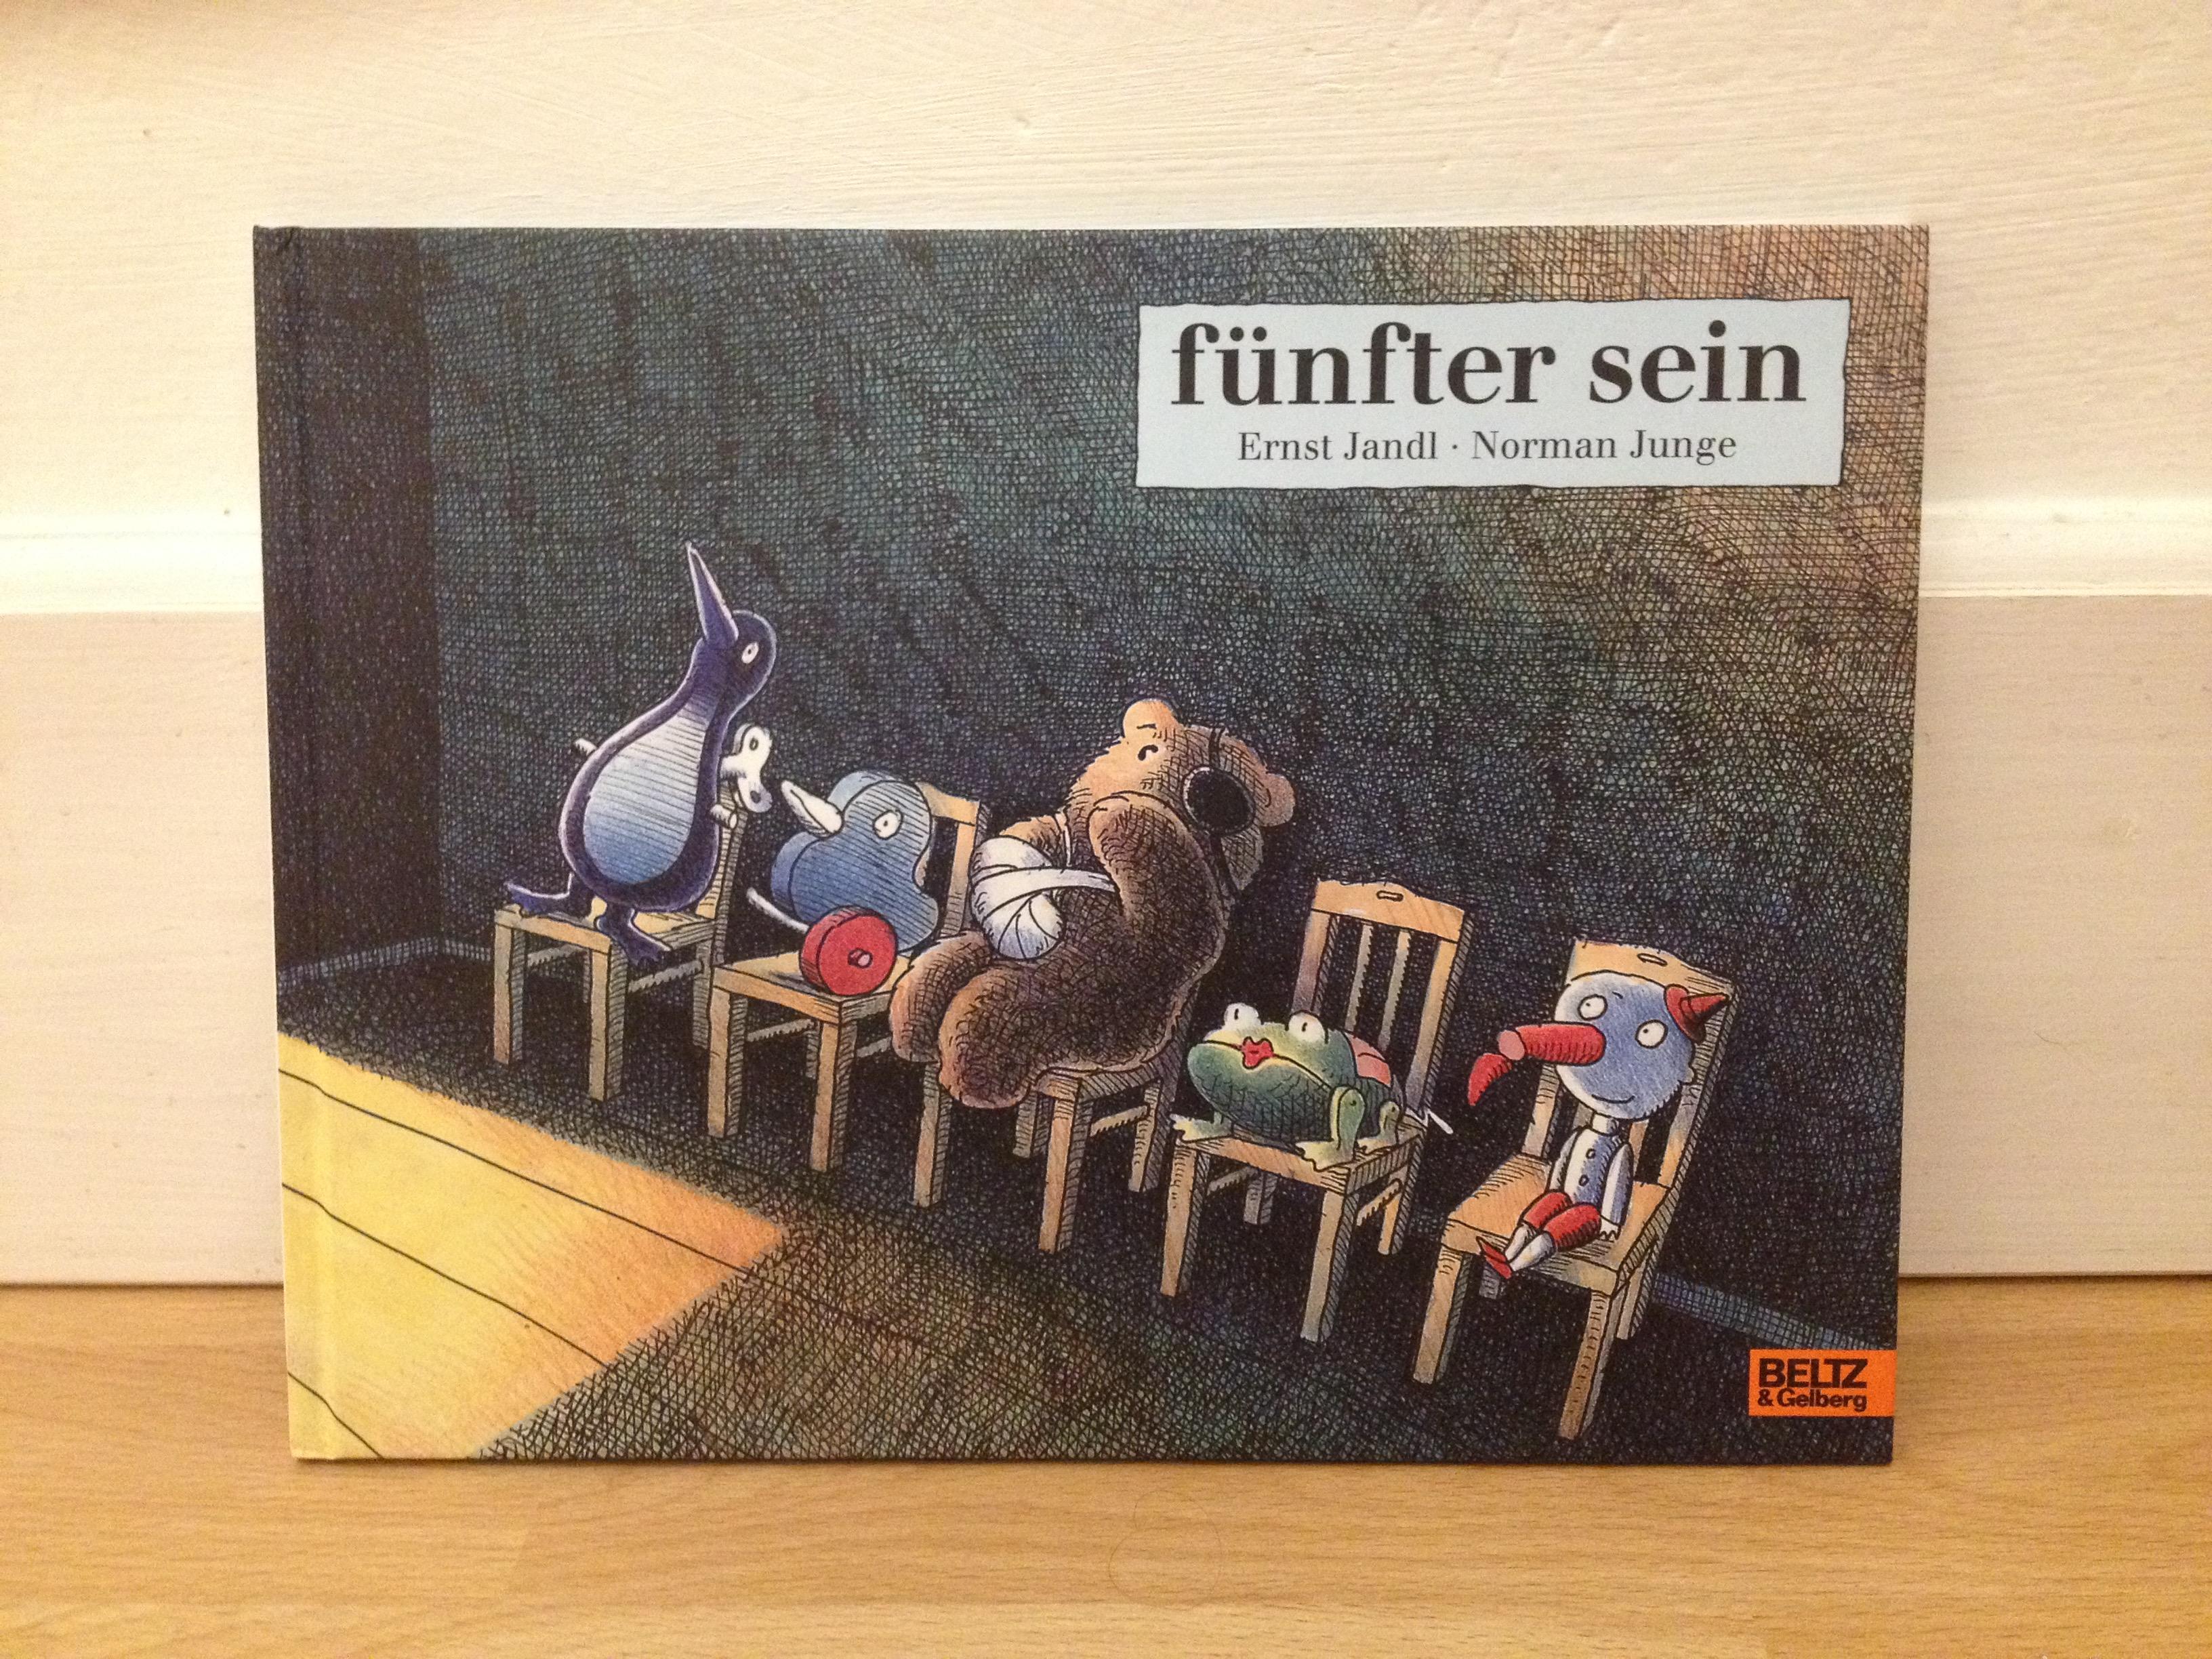 fünfter sein Book Cover